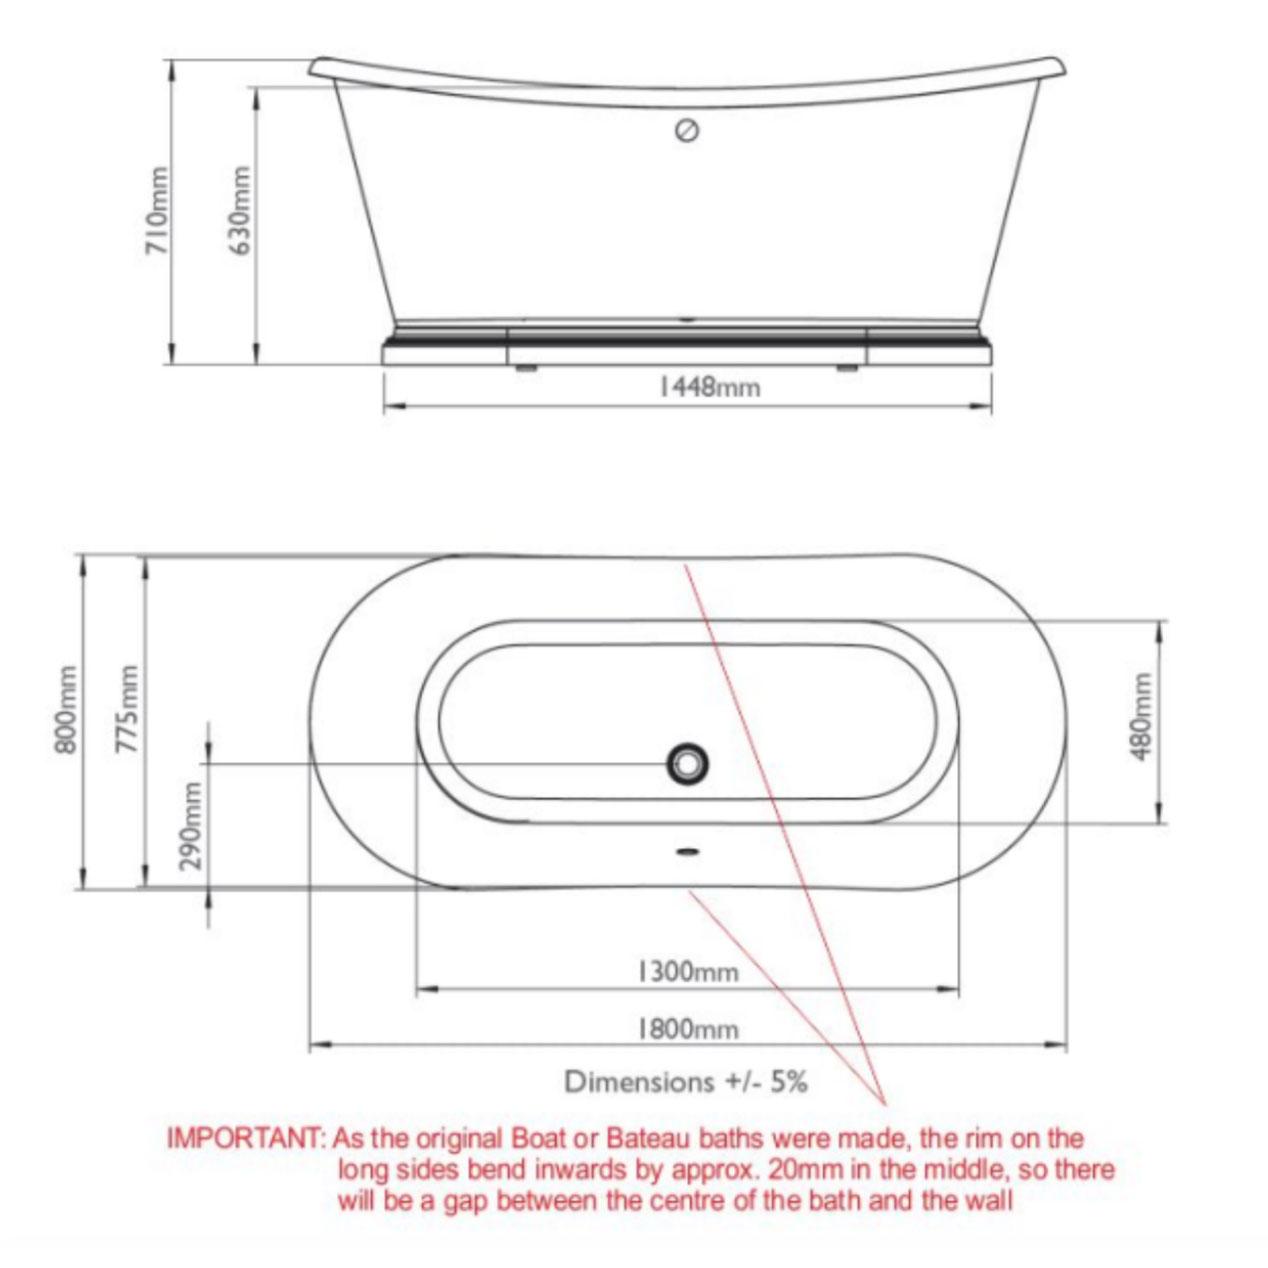 Bathwaters 1800 Boat Bath Technical